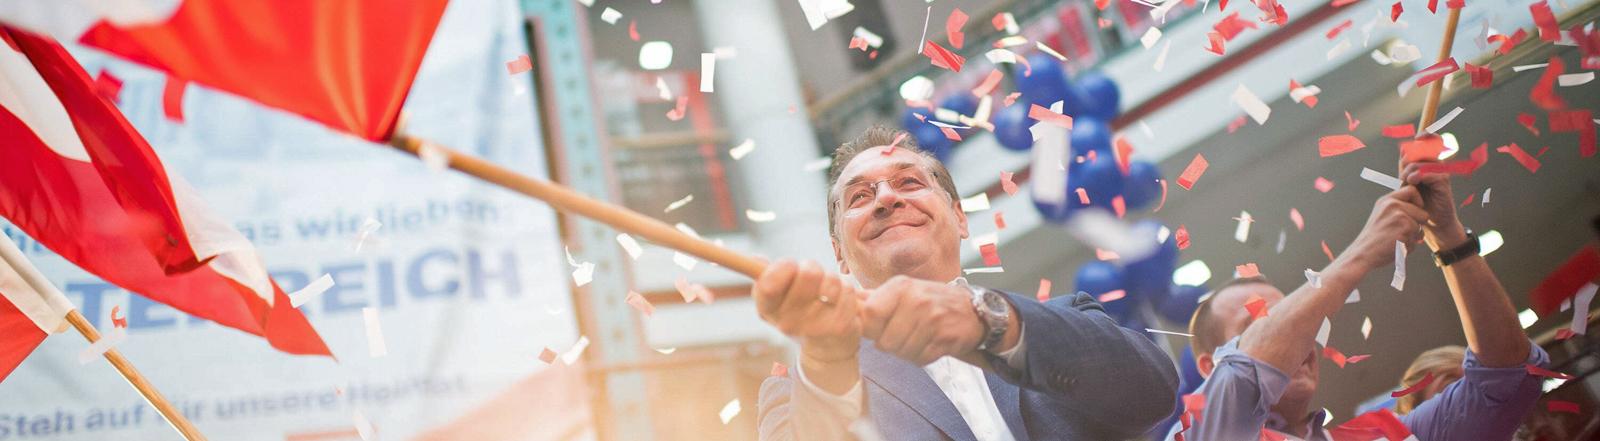 Im Wahlkampf: FPÖ-Vizekanzler Heinz-Christian Strache